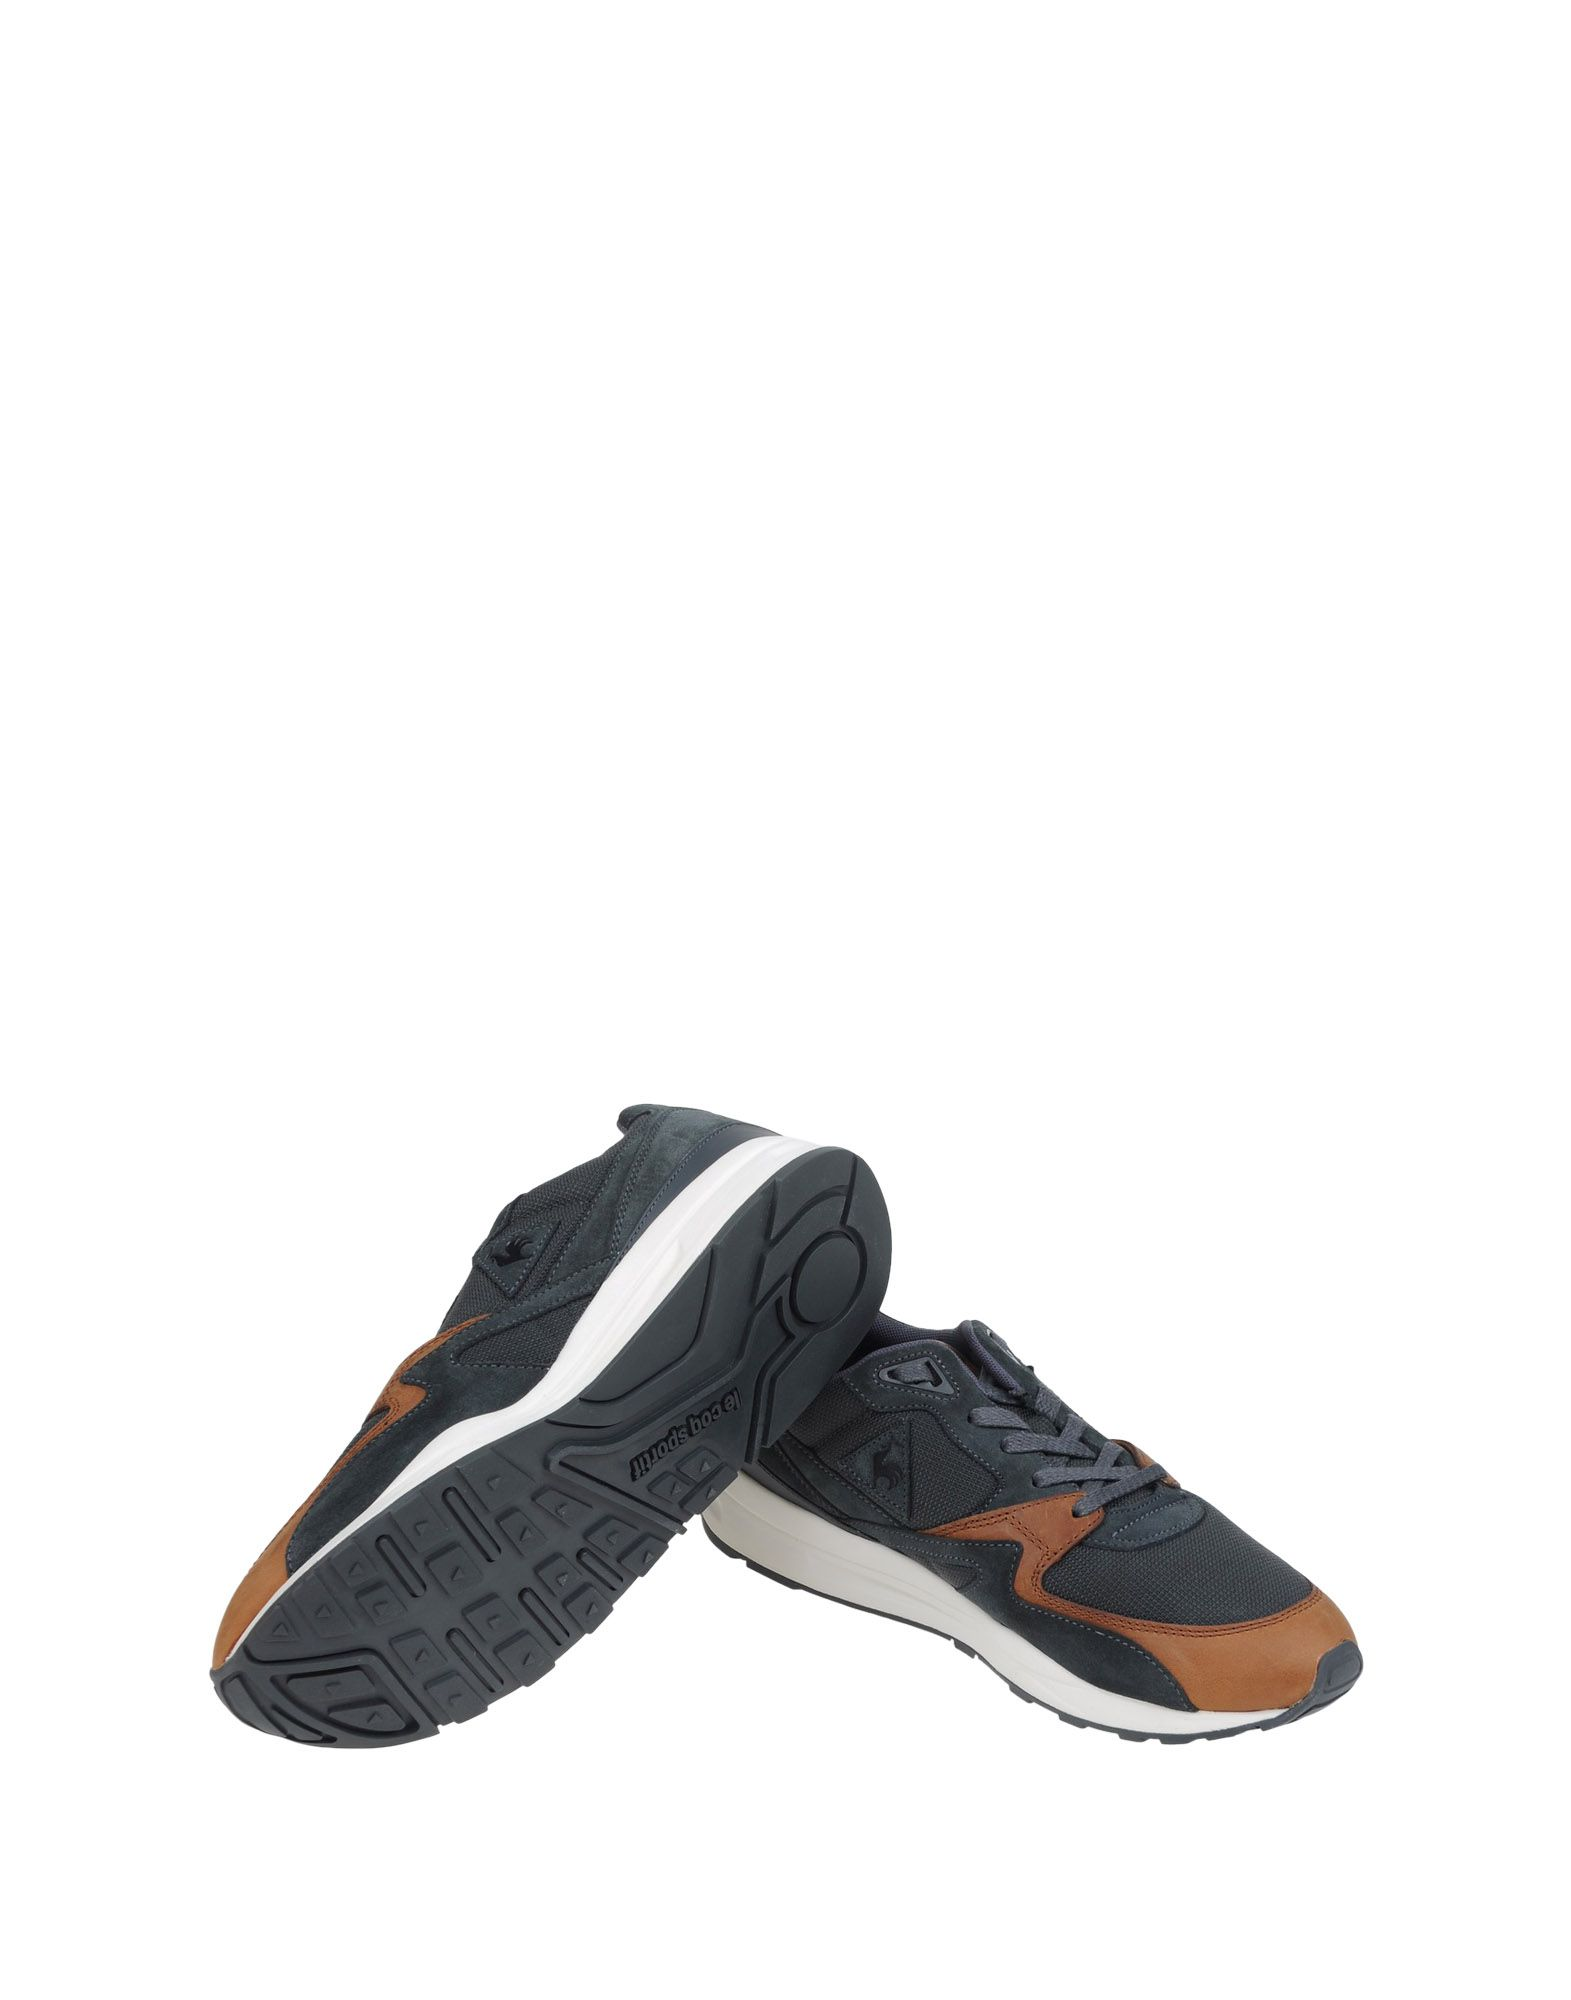 Sneakers Le Coq Sportif Lcs R800 C Cordura - Homme - Sneakers Le Coq Sportif sur